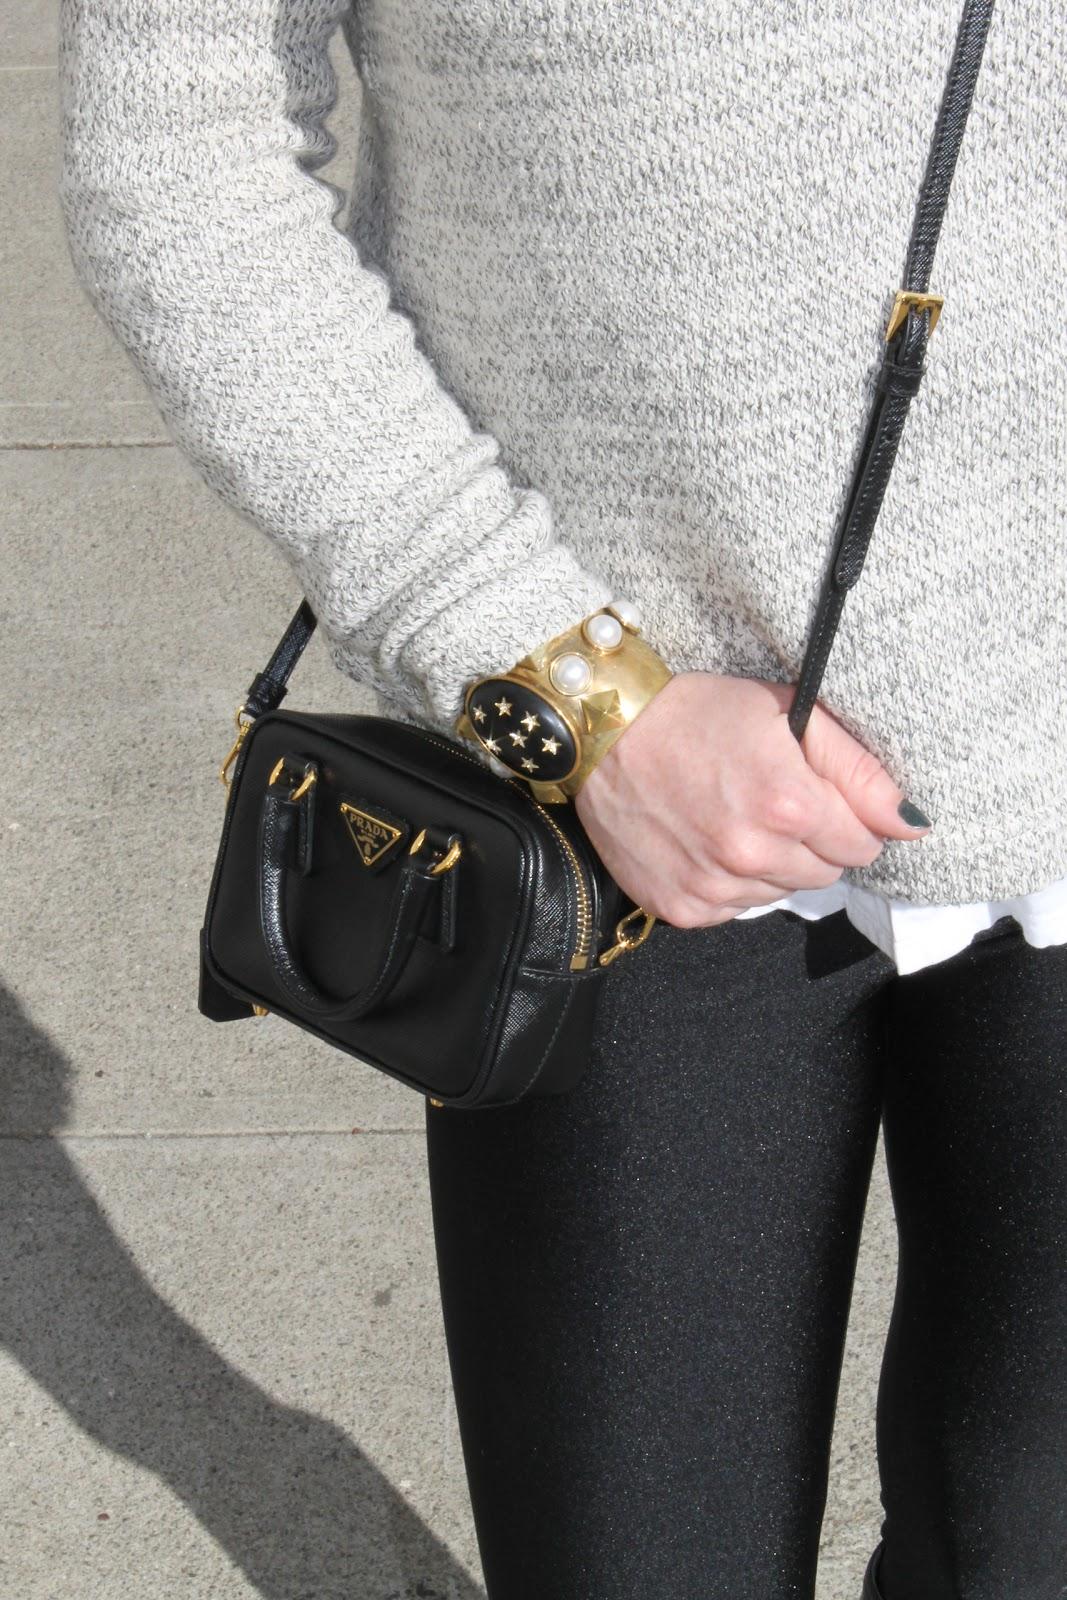 c5e802b68f SF Shop Girl  Outfit of the Day-Rock N  Gold